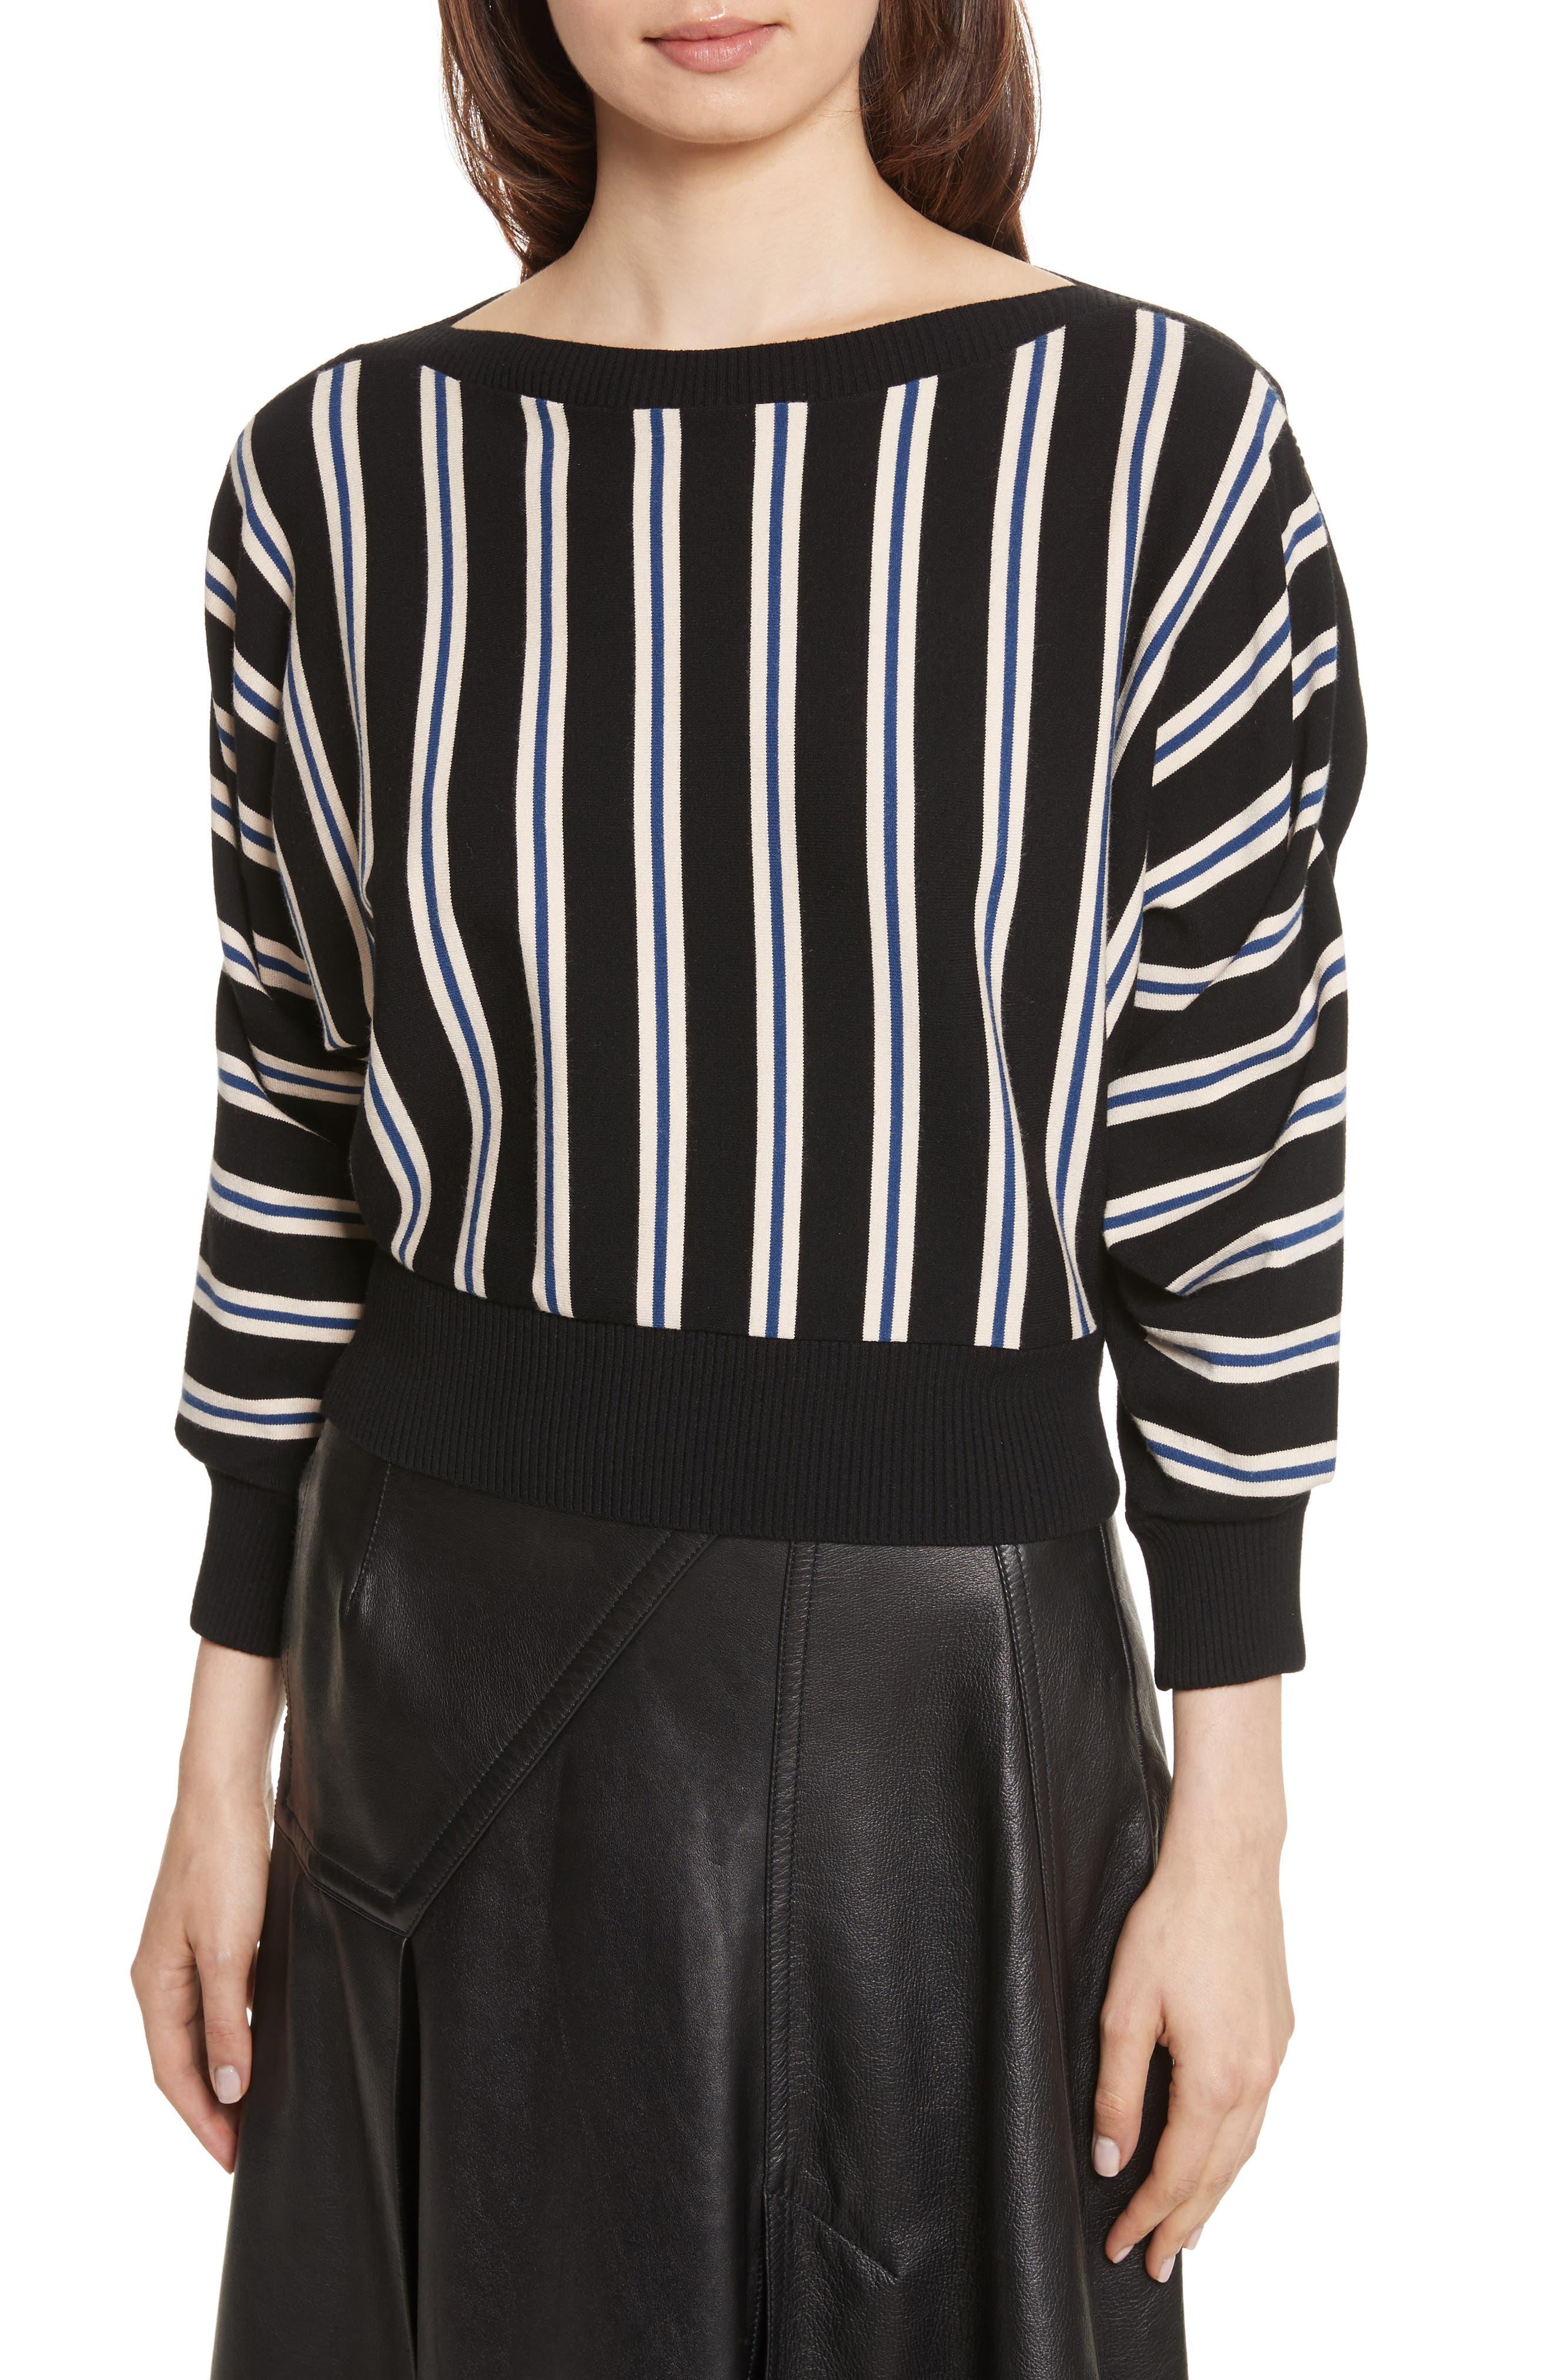 Alternate Image 1 Selected - 3.1 Phillip Lim Ottoman Stripe Pullover